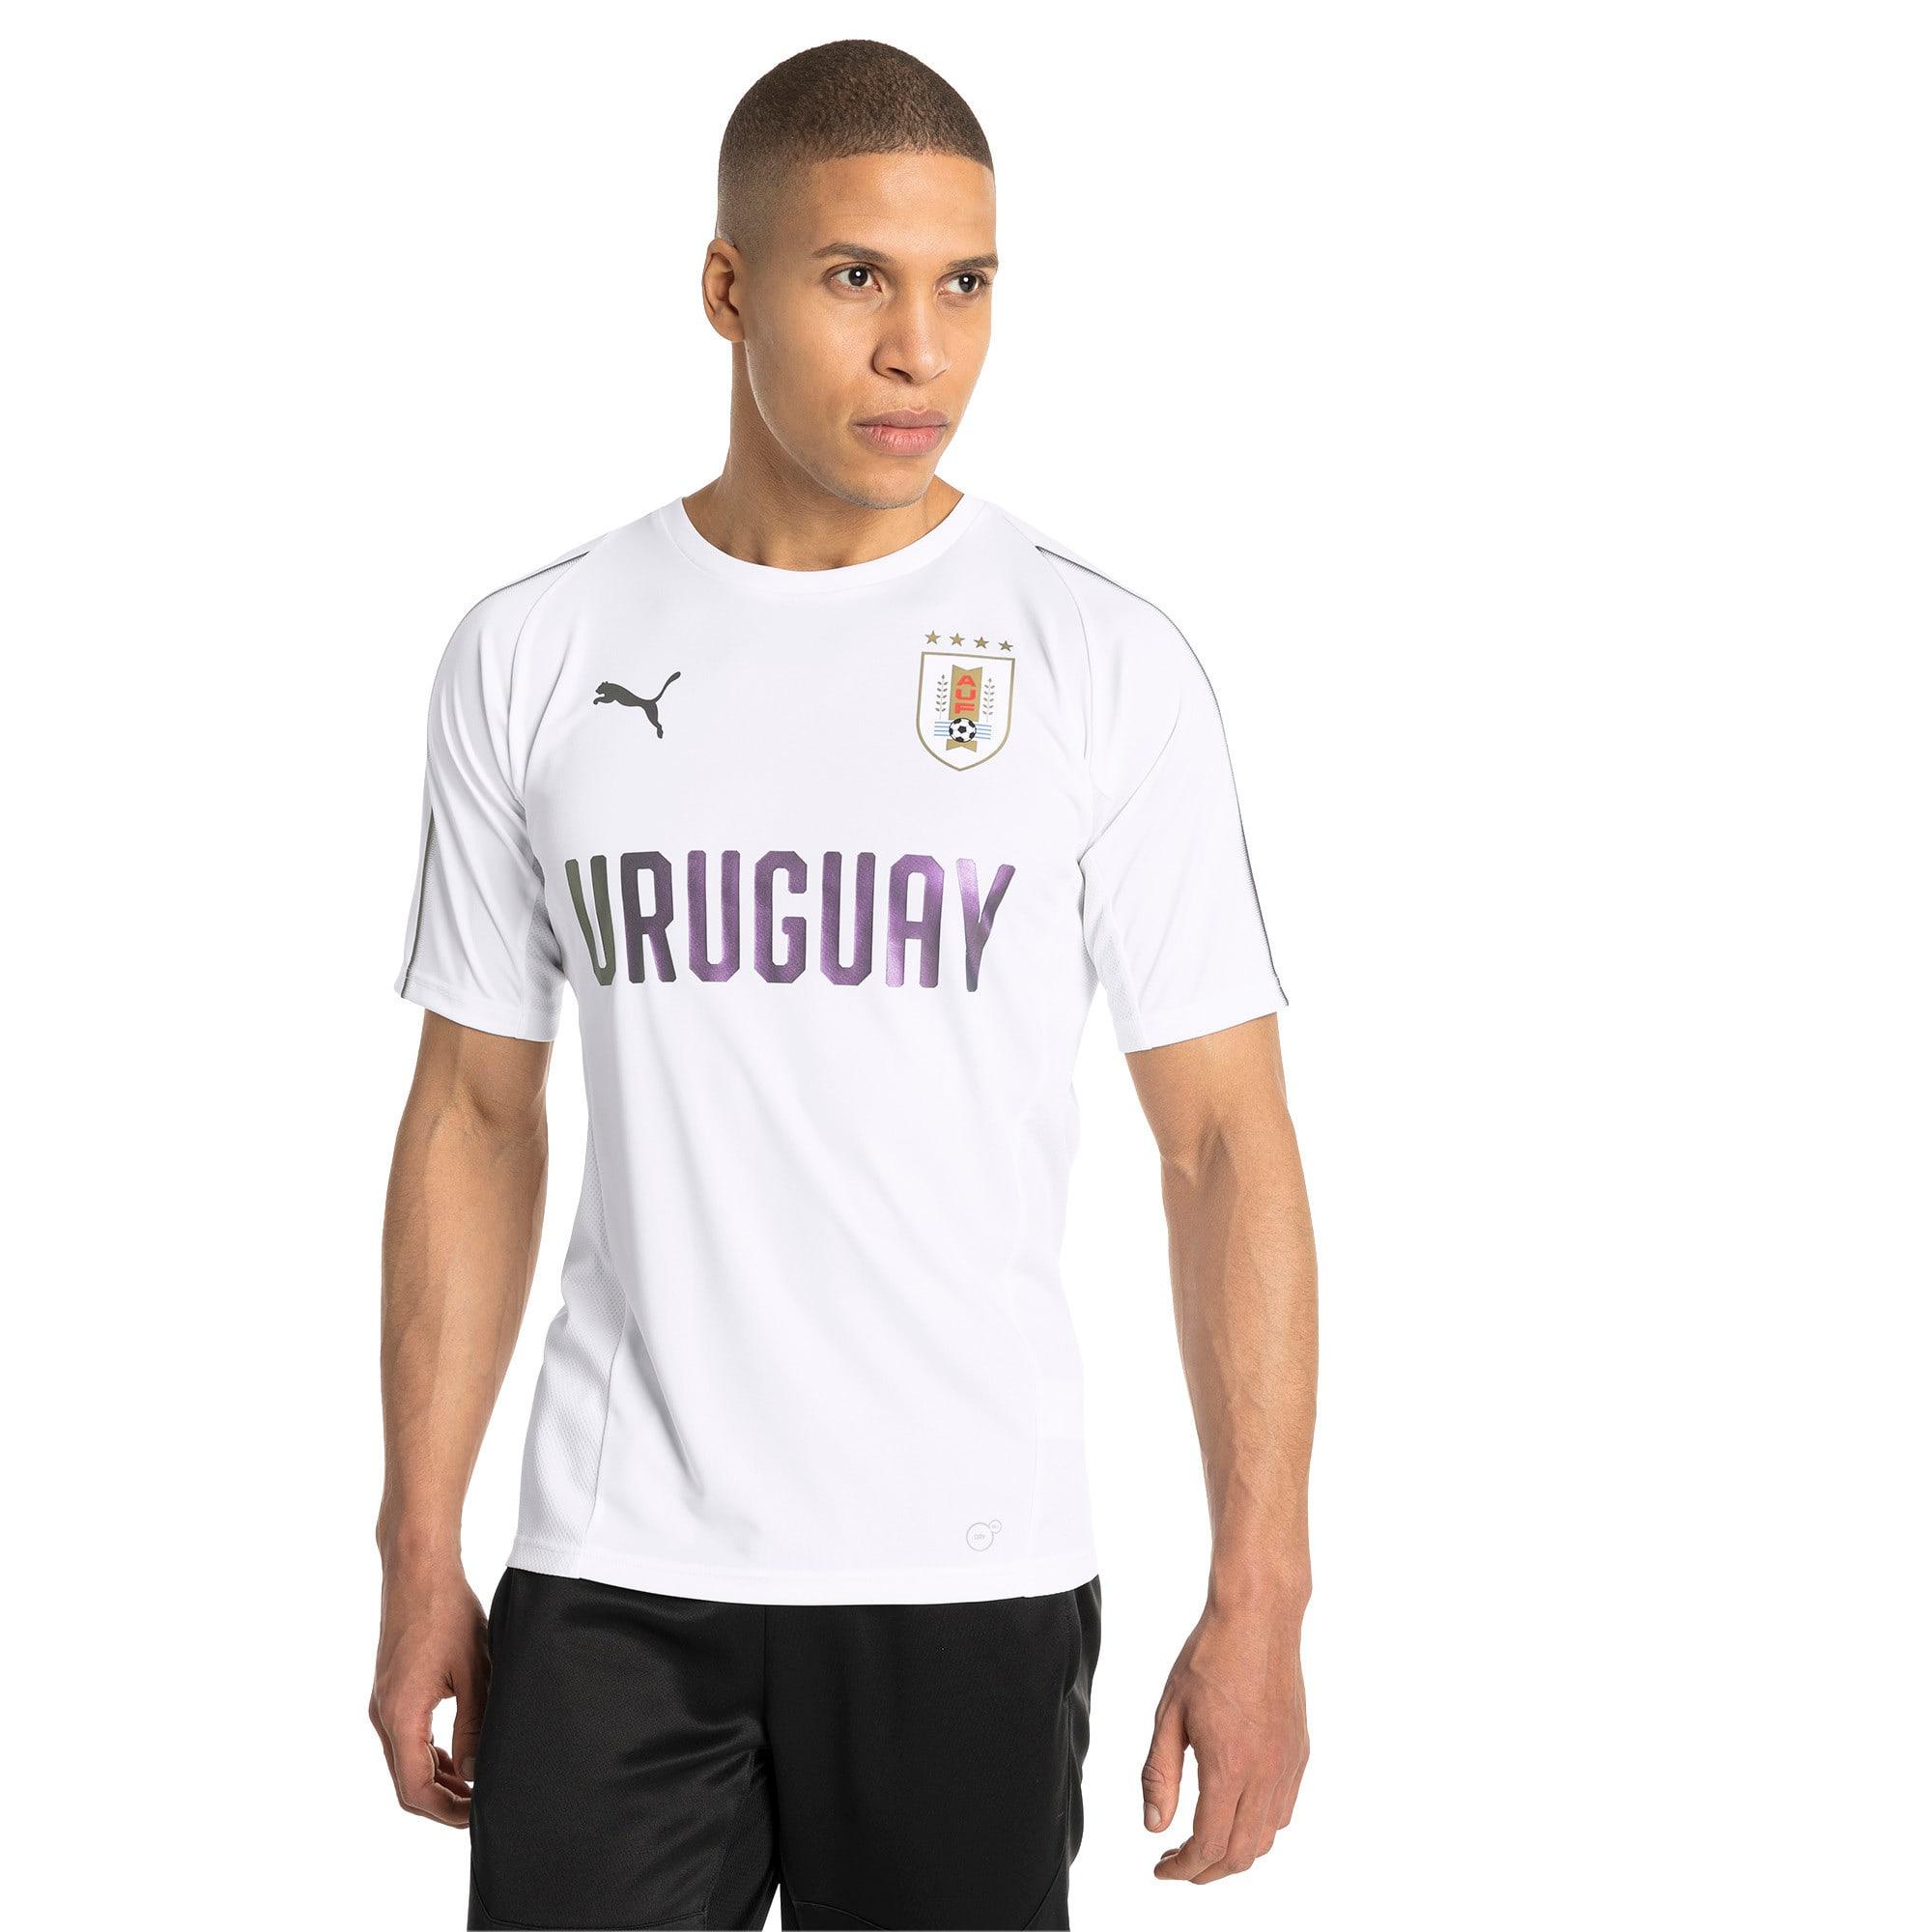 Thumbnail 2 of Uruguay Men's Training Jersey, Puma White, medium